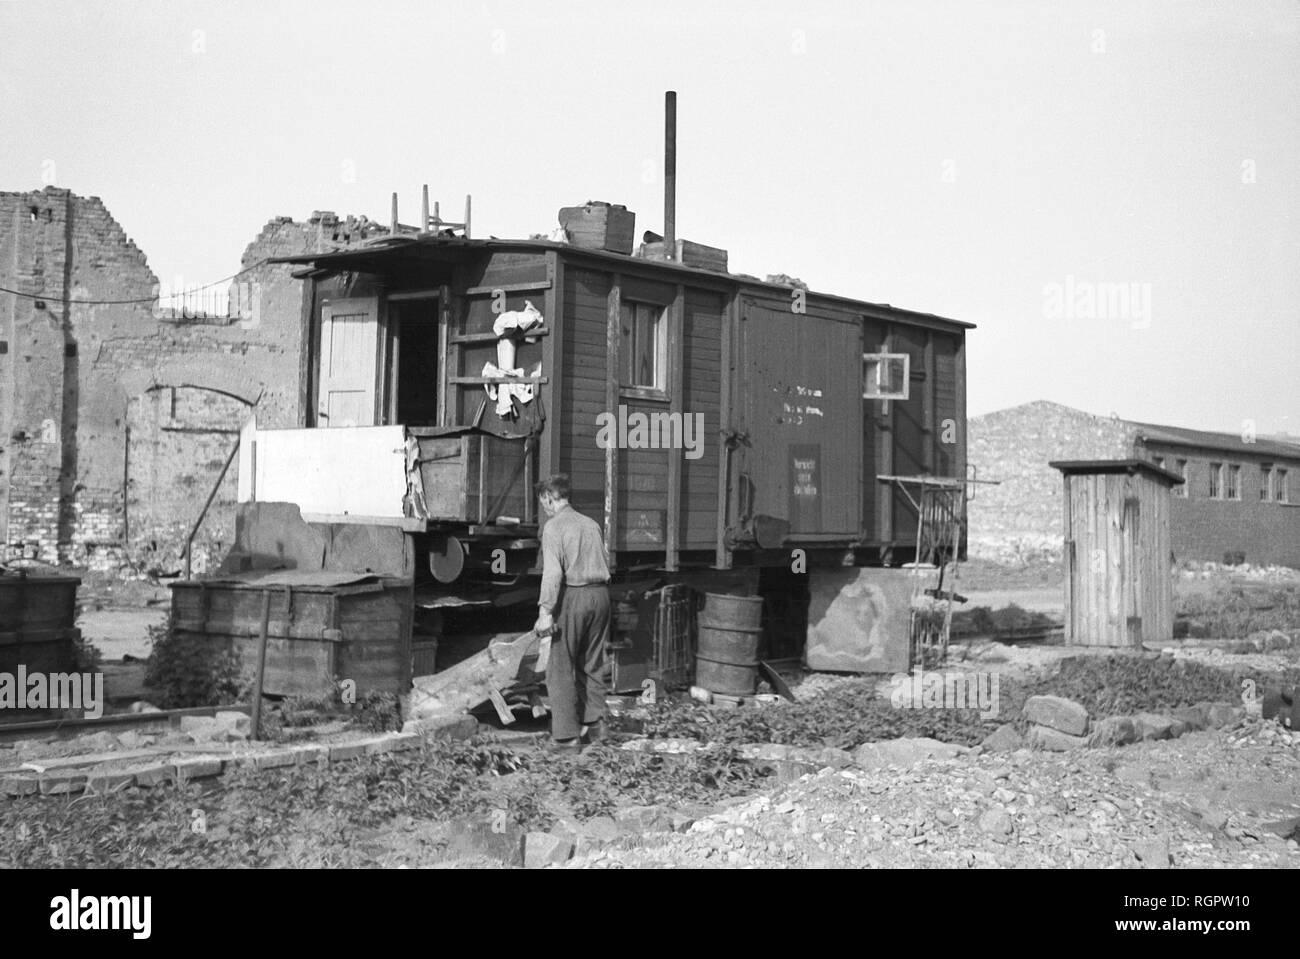 Emergency housing and makeshift accommodation, living in the railway wagon 1948, Leipzig, Saxony, GDR, Germany - Stock Image